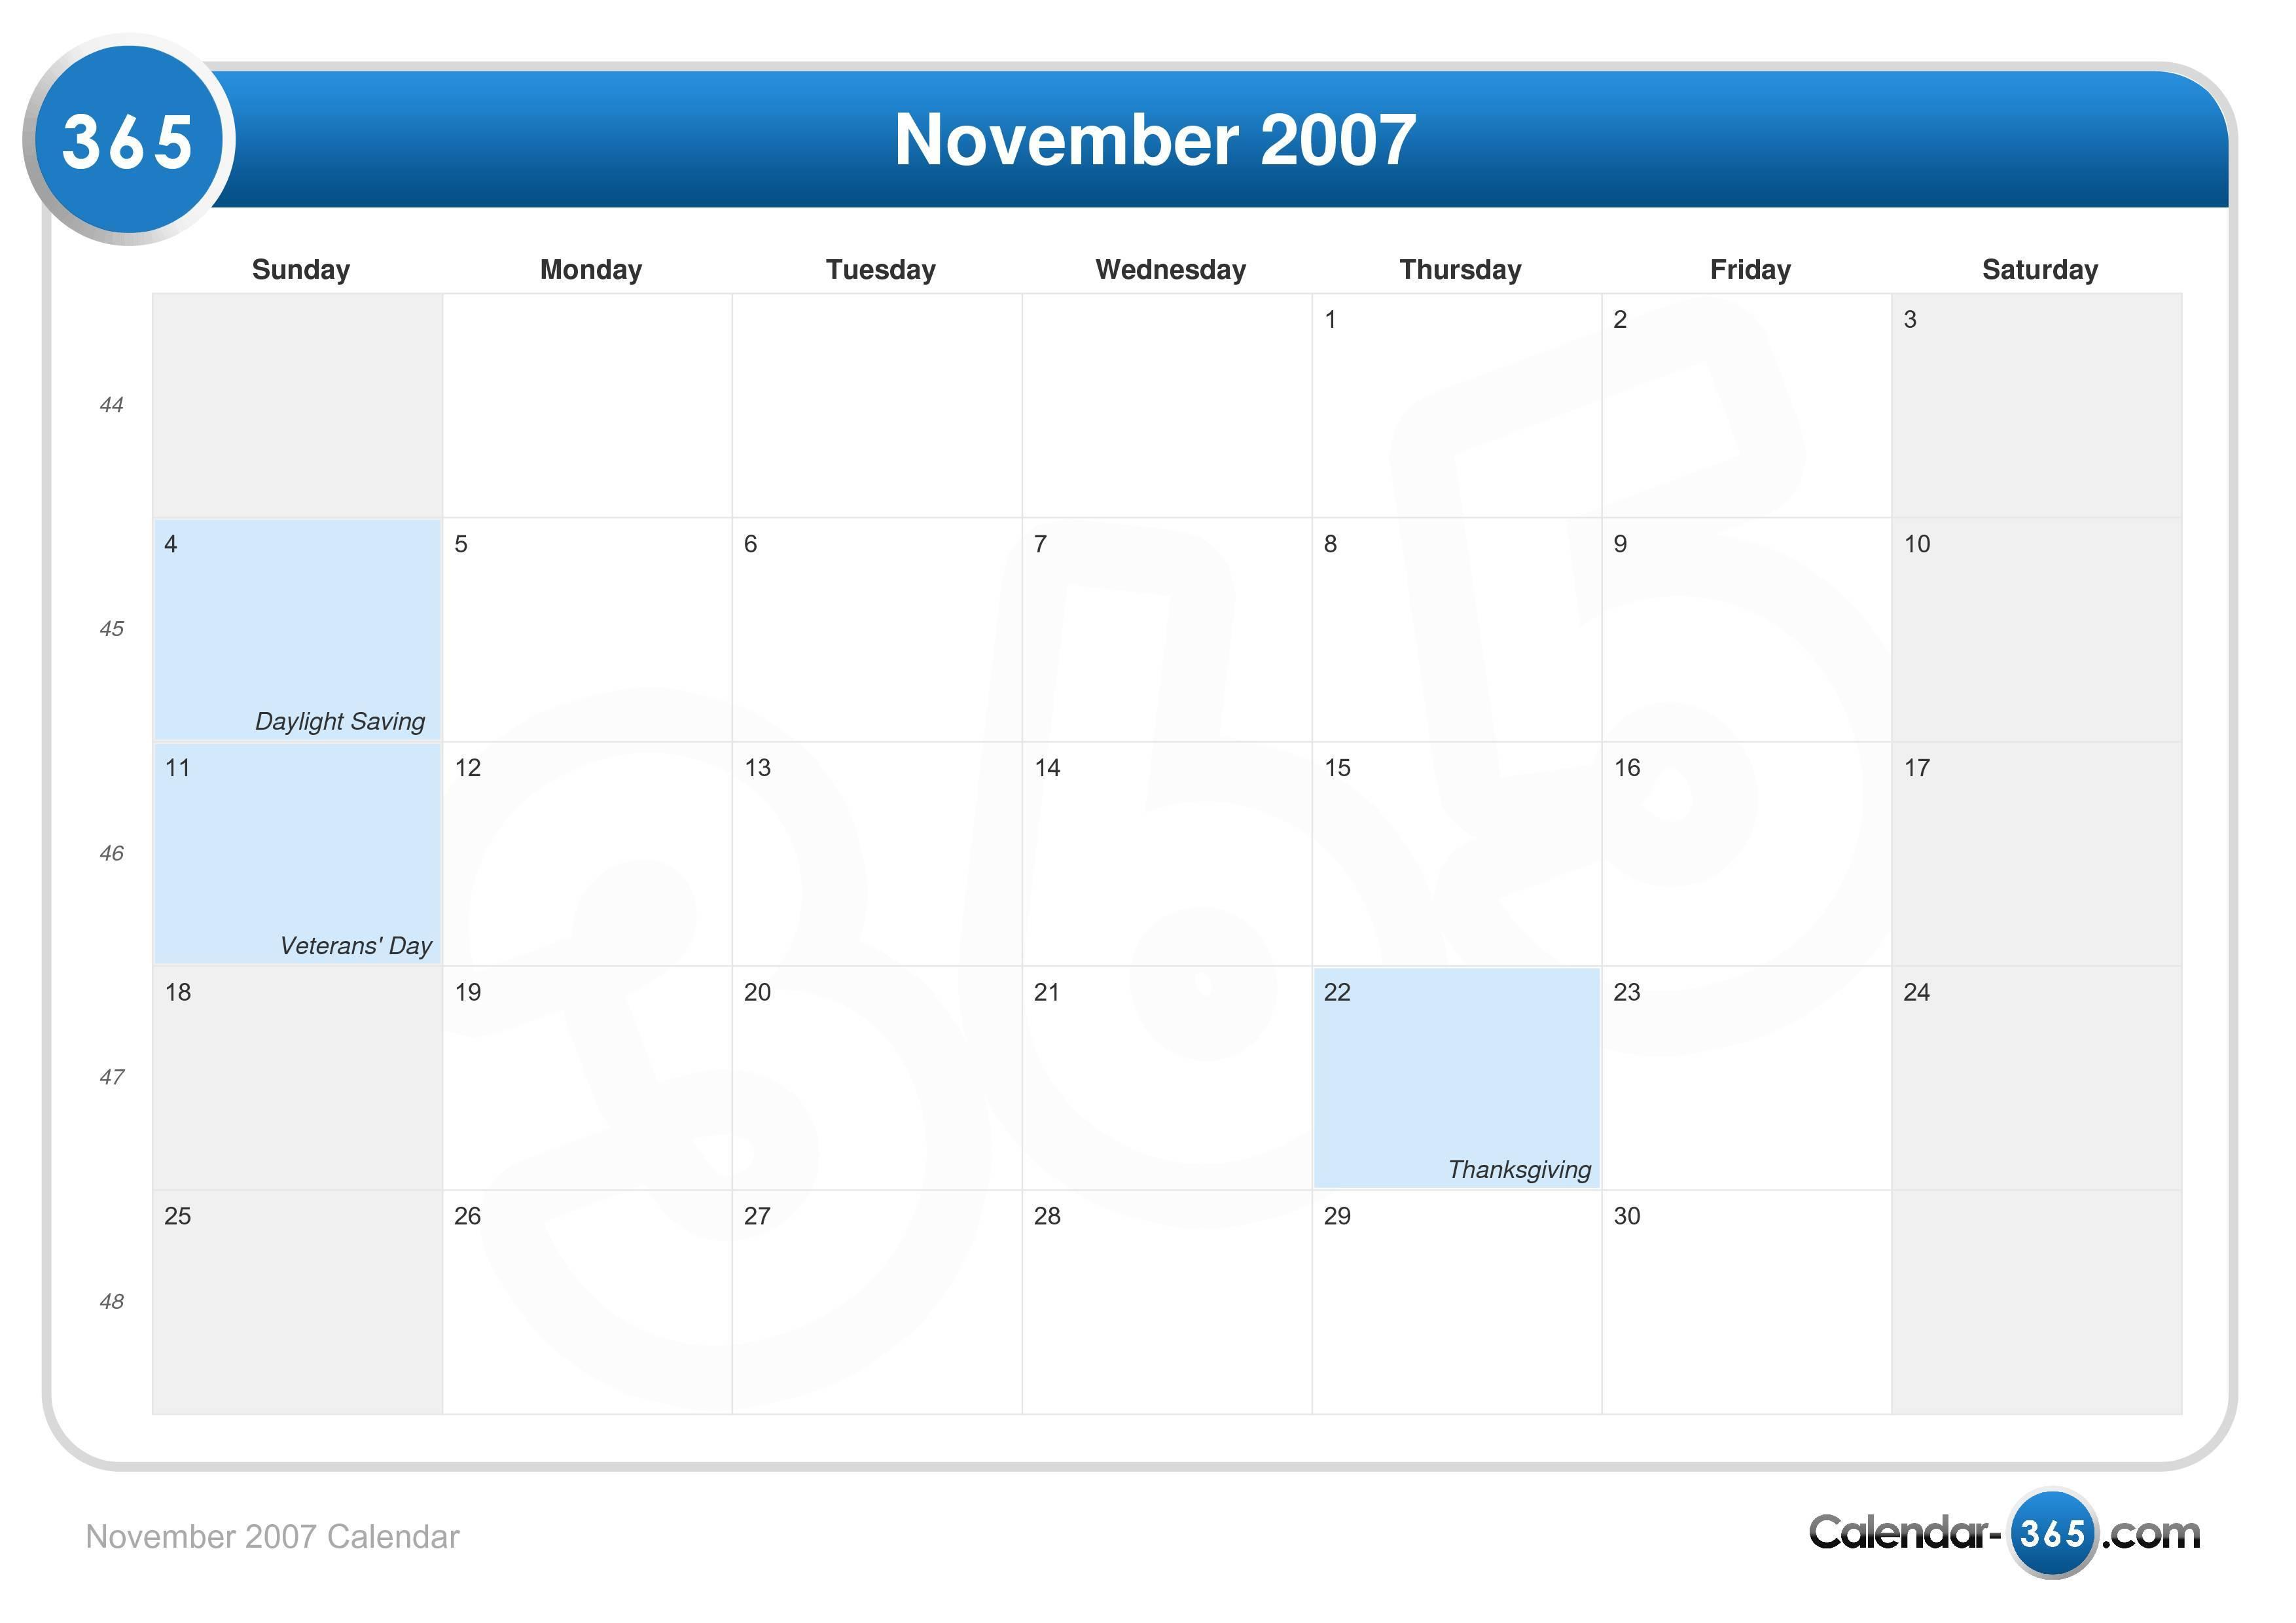 November 2007 Calendar